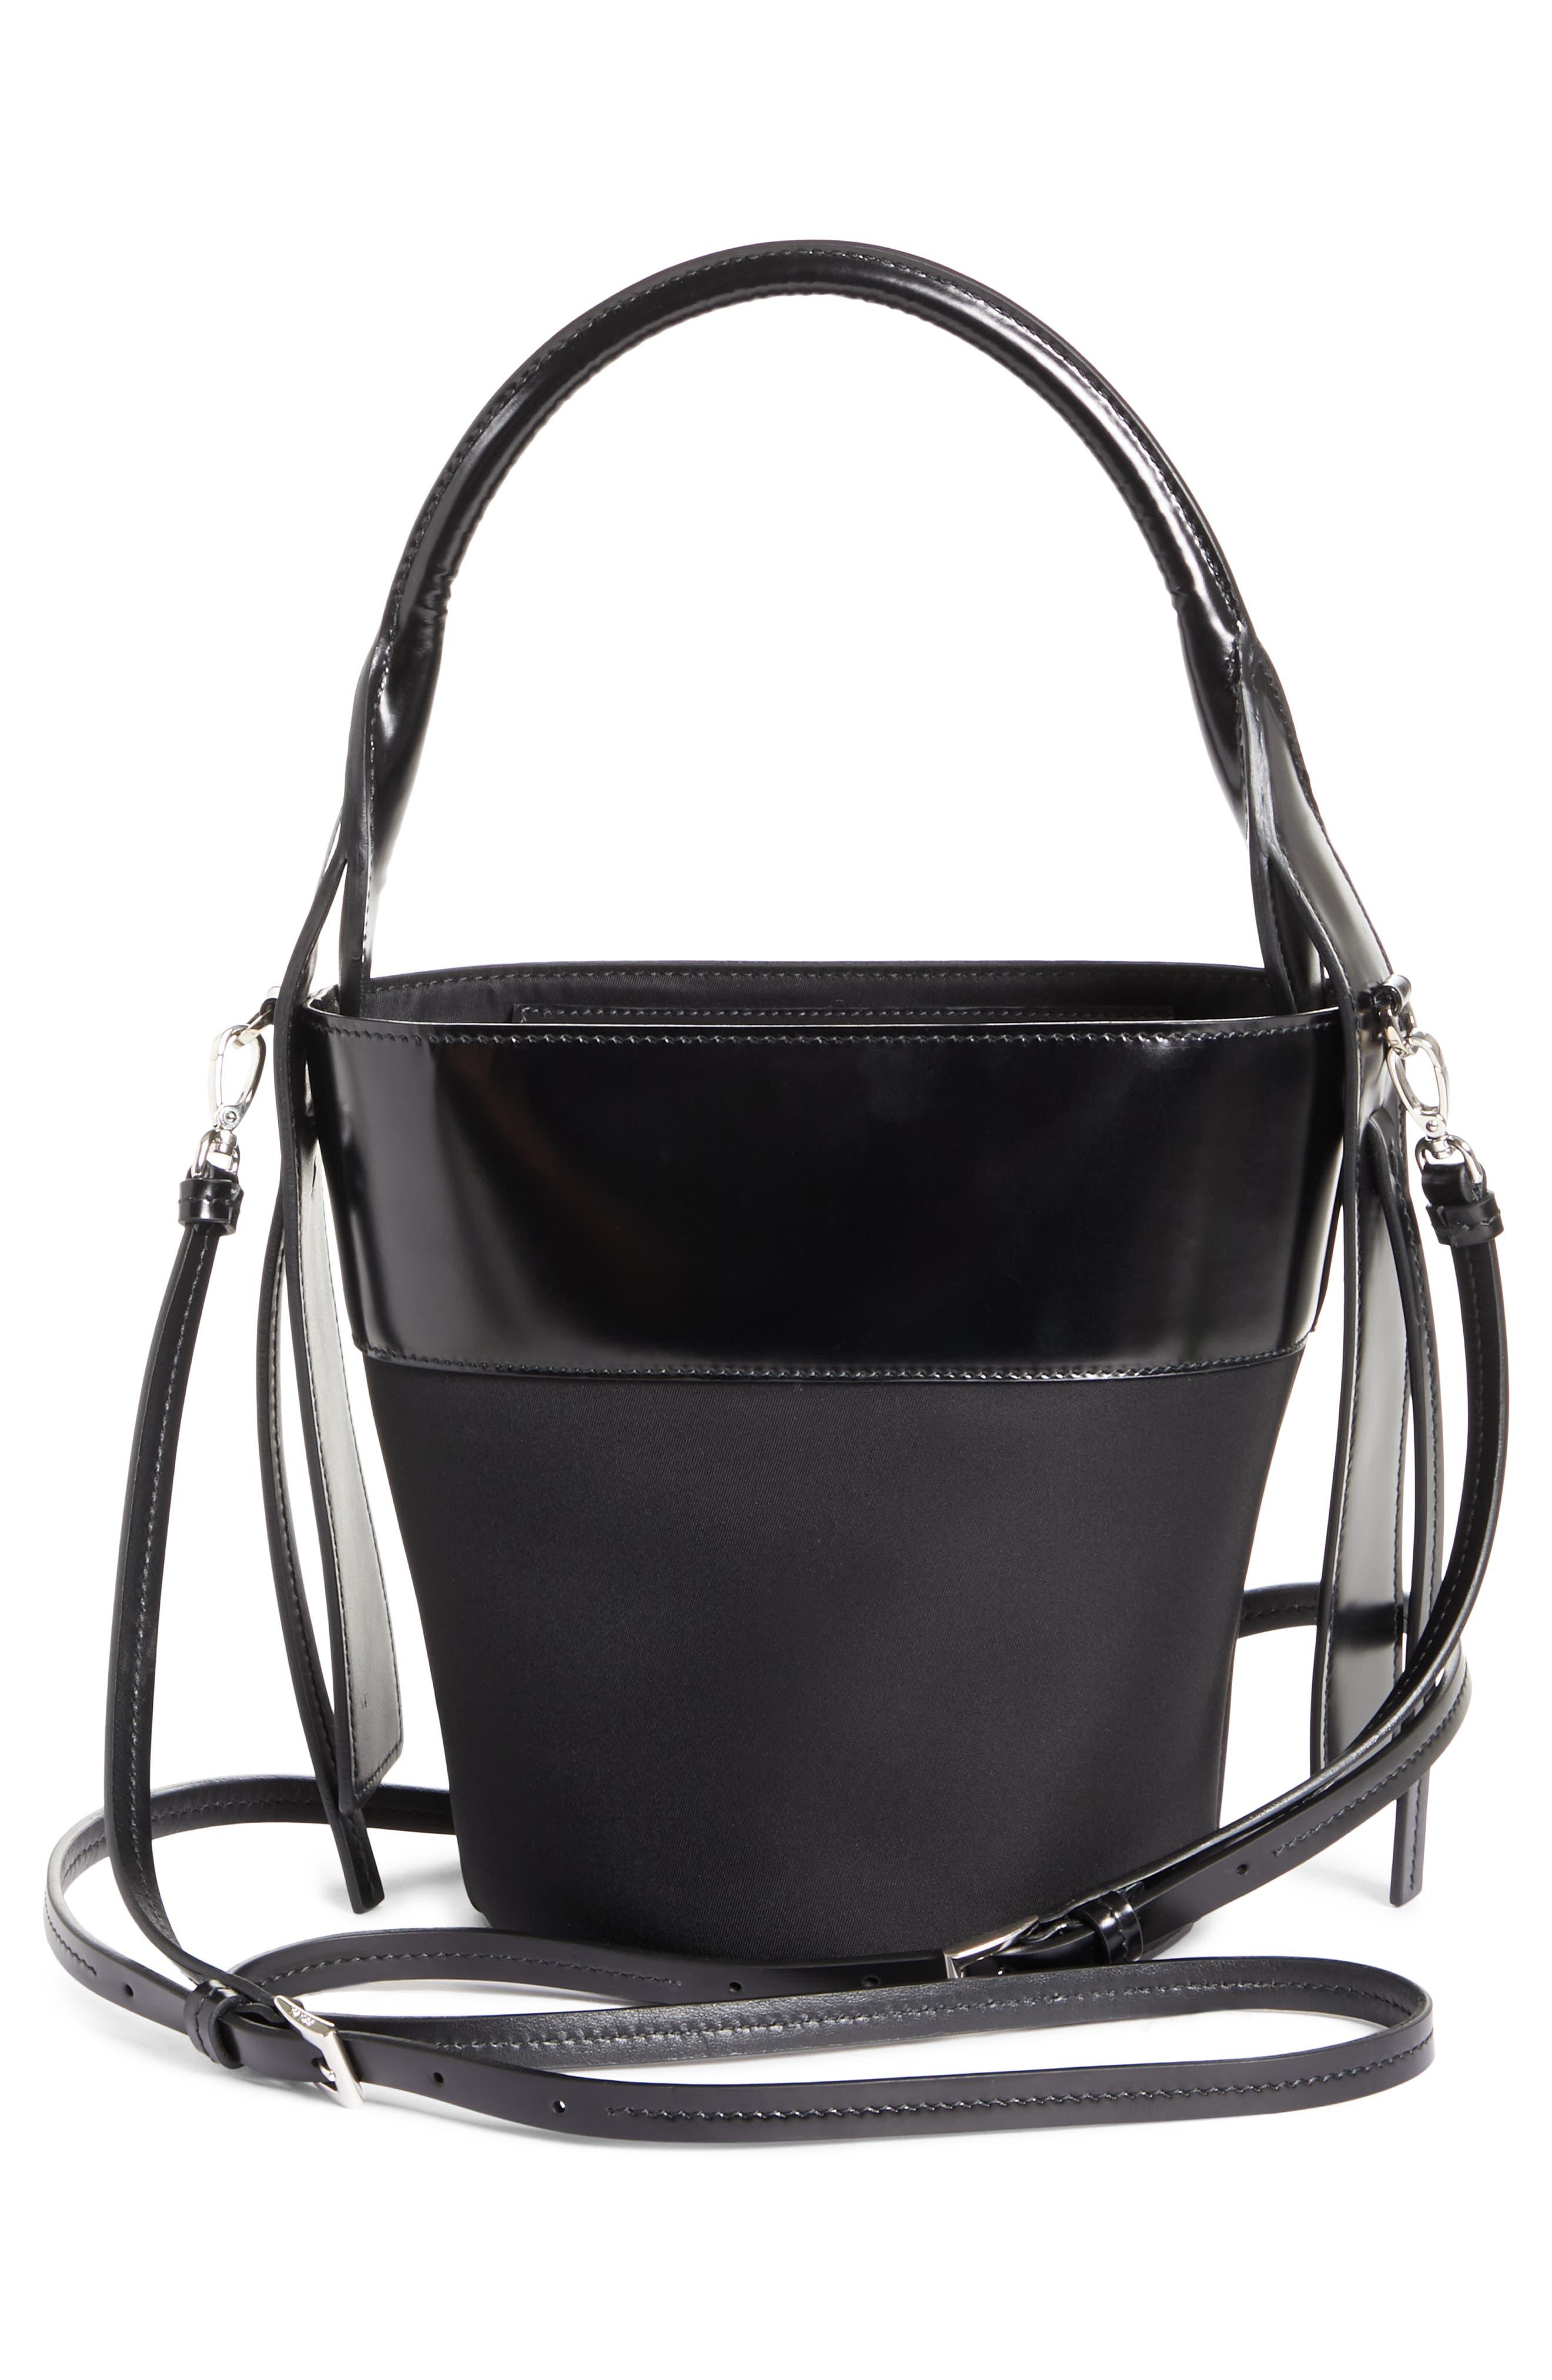 PRADA, Ouverture Tessuto Bucket Bag, Alternate thumbnail 4, color, NERO/ BIANCO